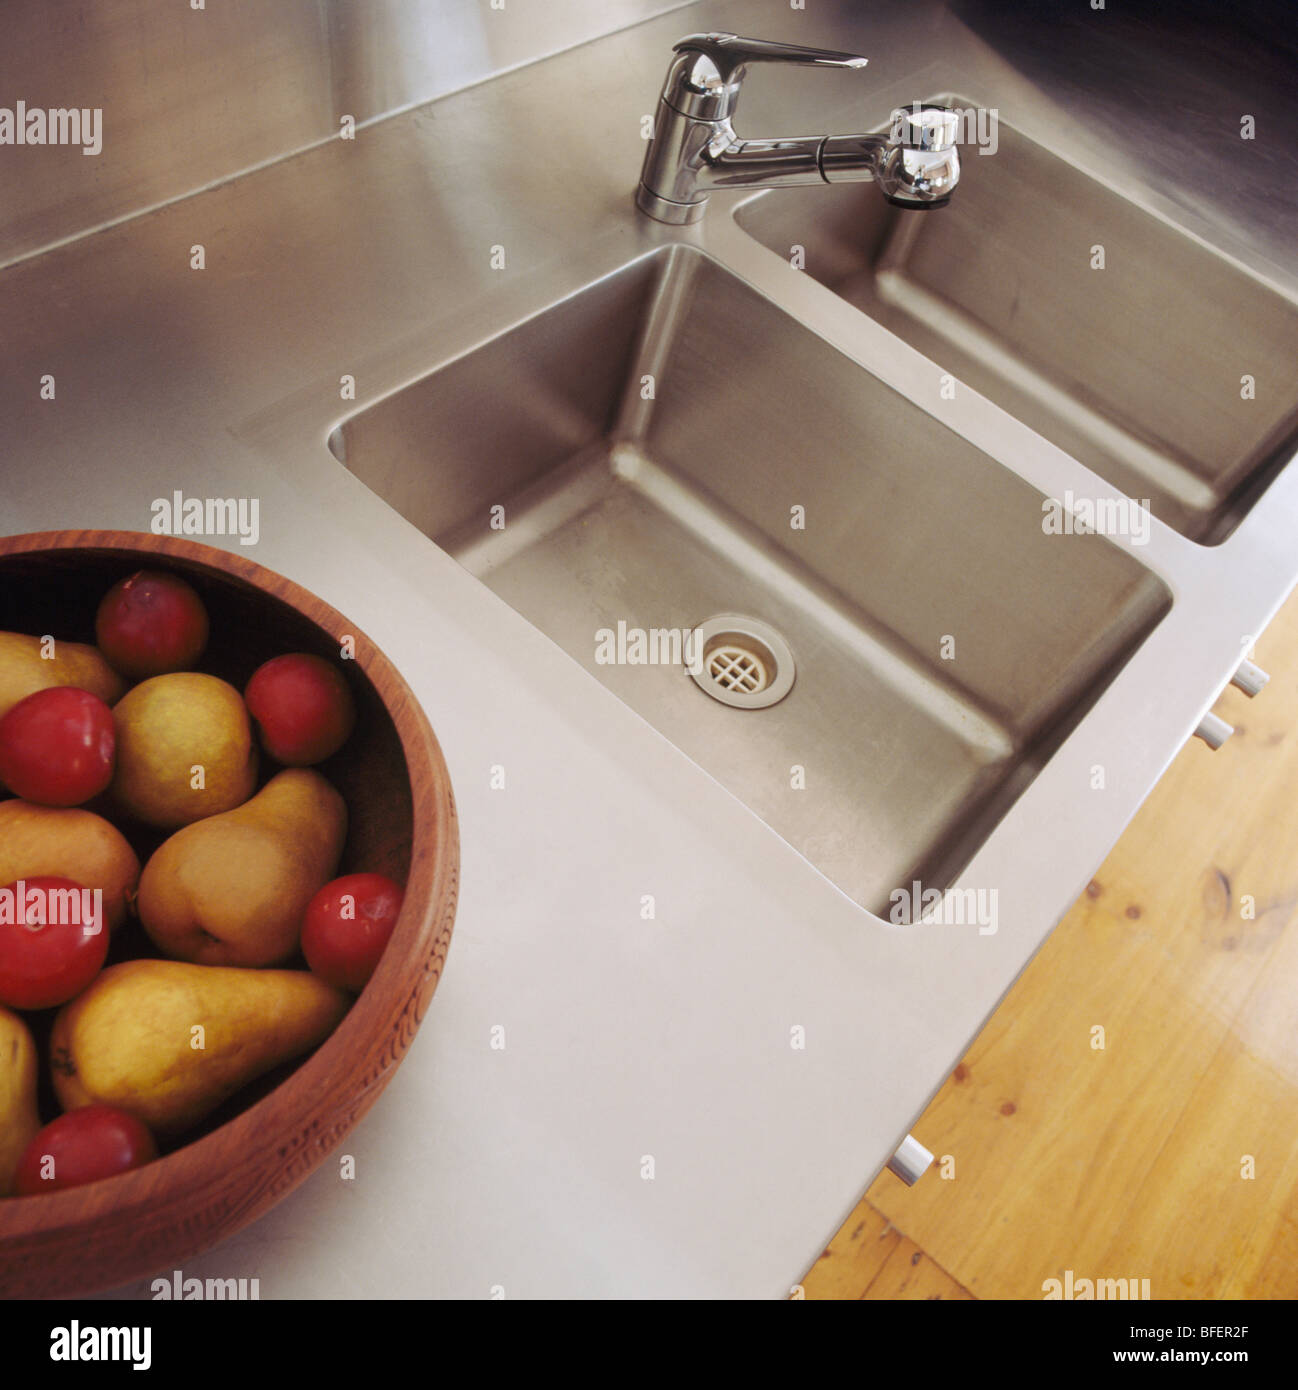 Wunderbar Billige Küchenspülen Uk Ideen - Küche Set Ideen ...